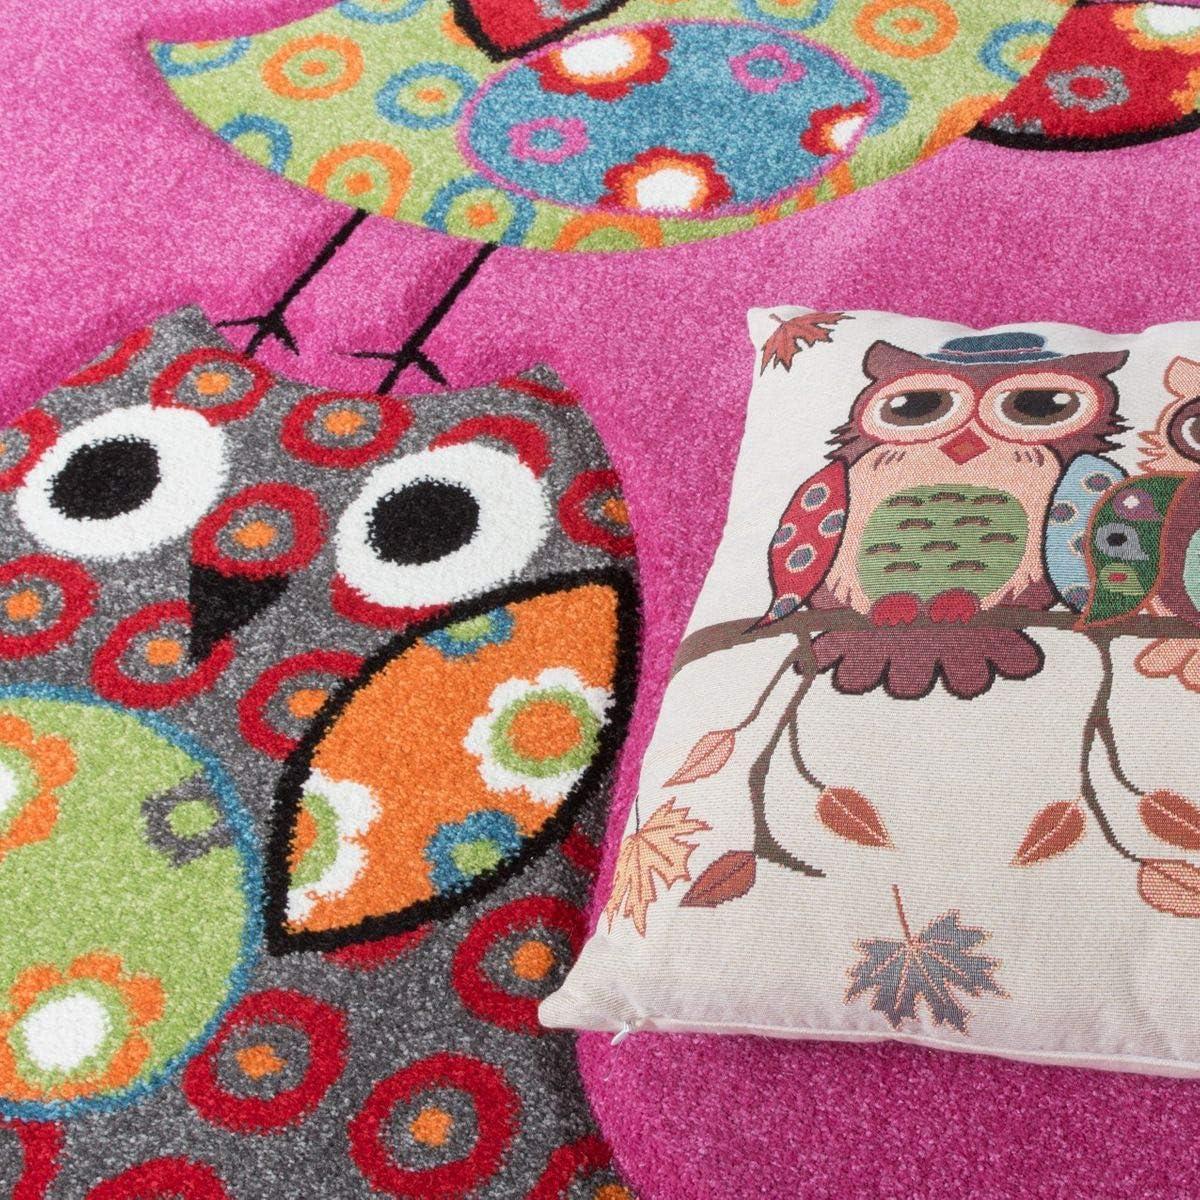 magenta Polypropylene TT Home Childrens Bedroom Rug with Contour Cut Design Pink Fuchsia Green Cream 80 x 150 cm